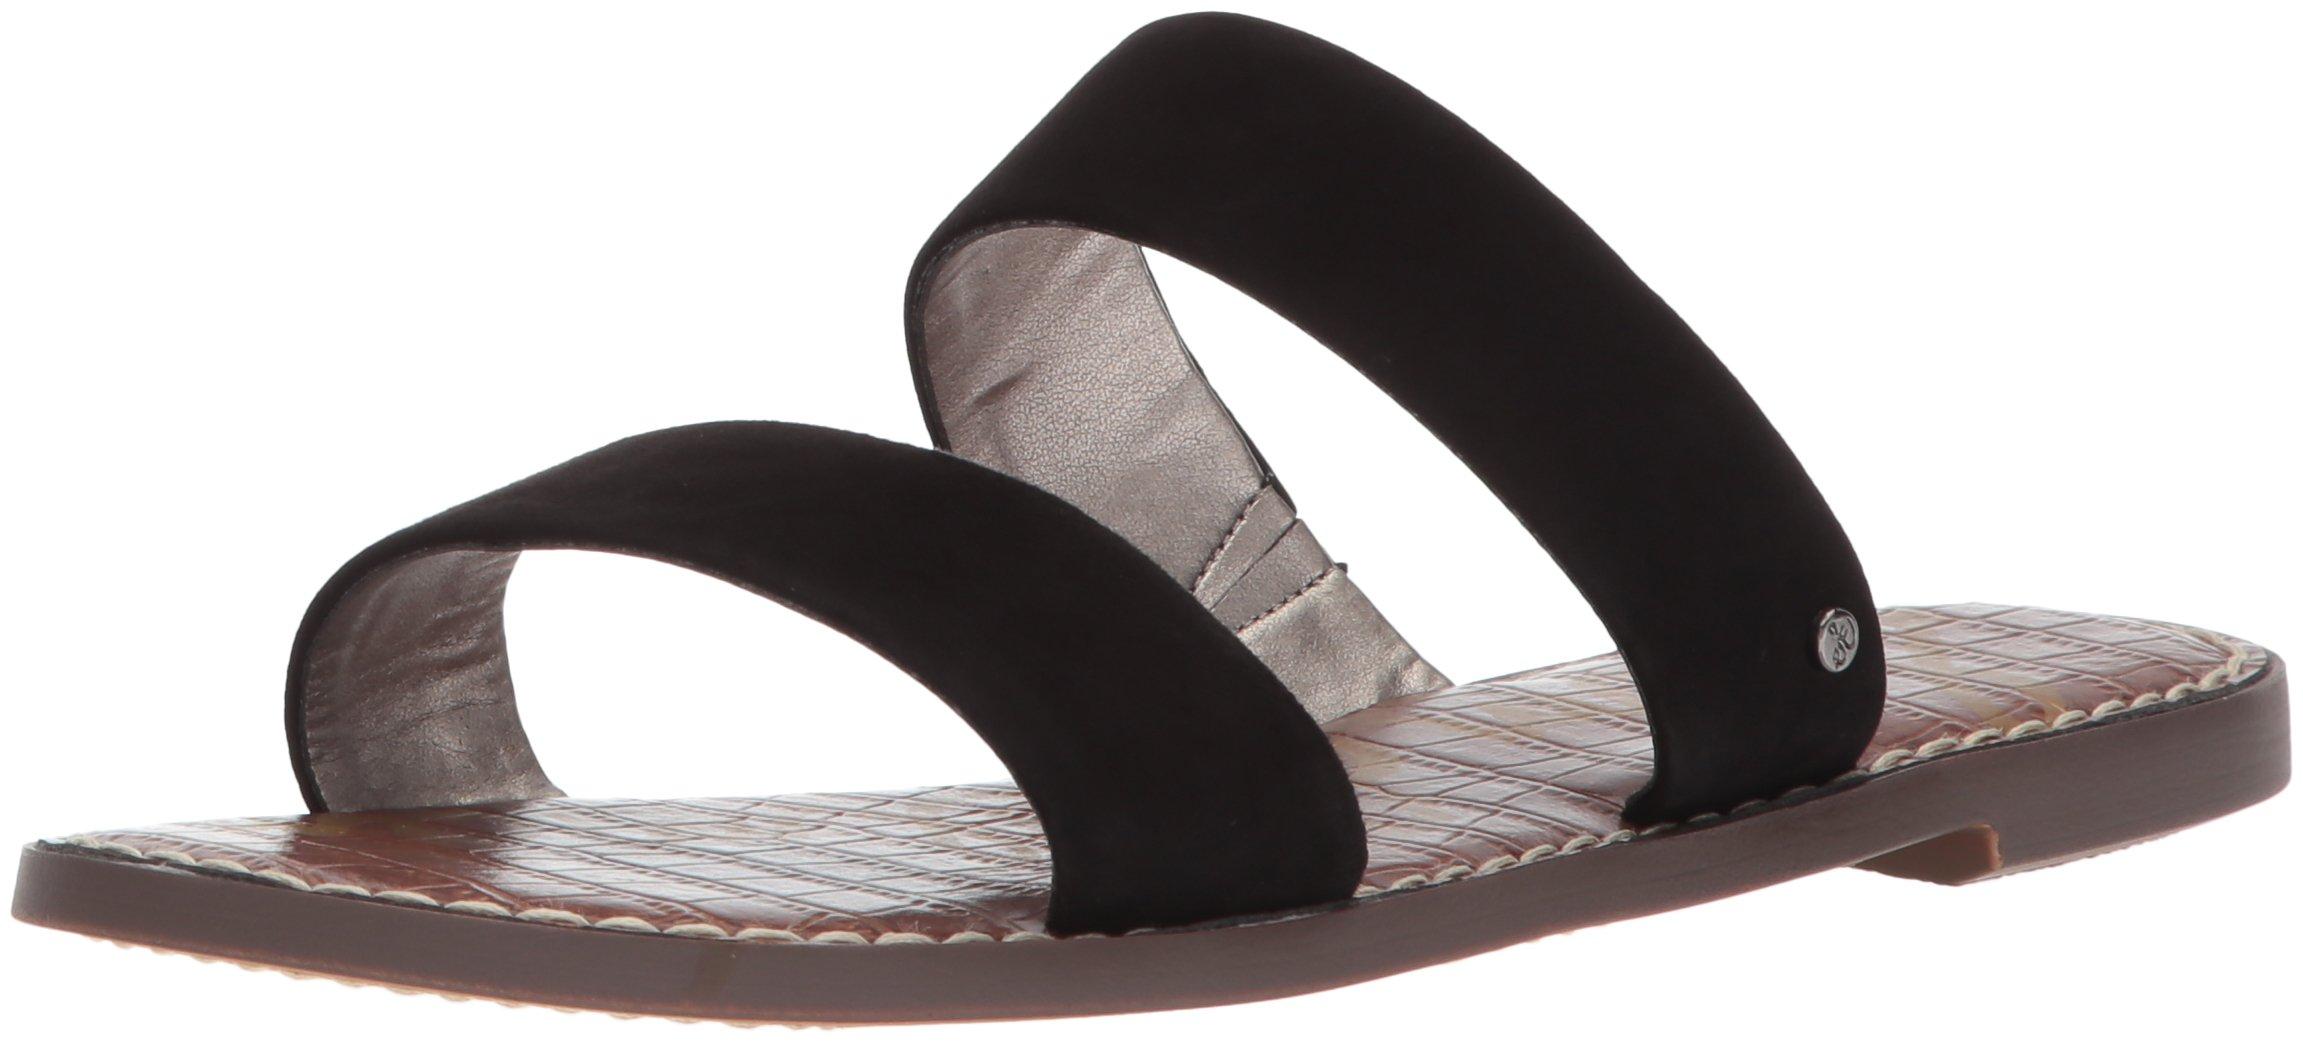 Sam Edelman Women's Gala Slide Sandal, Black Suede, 8 M US